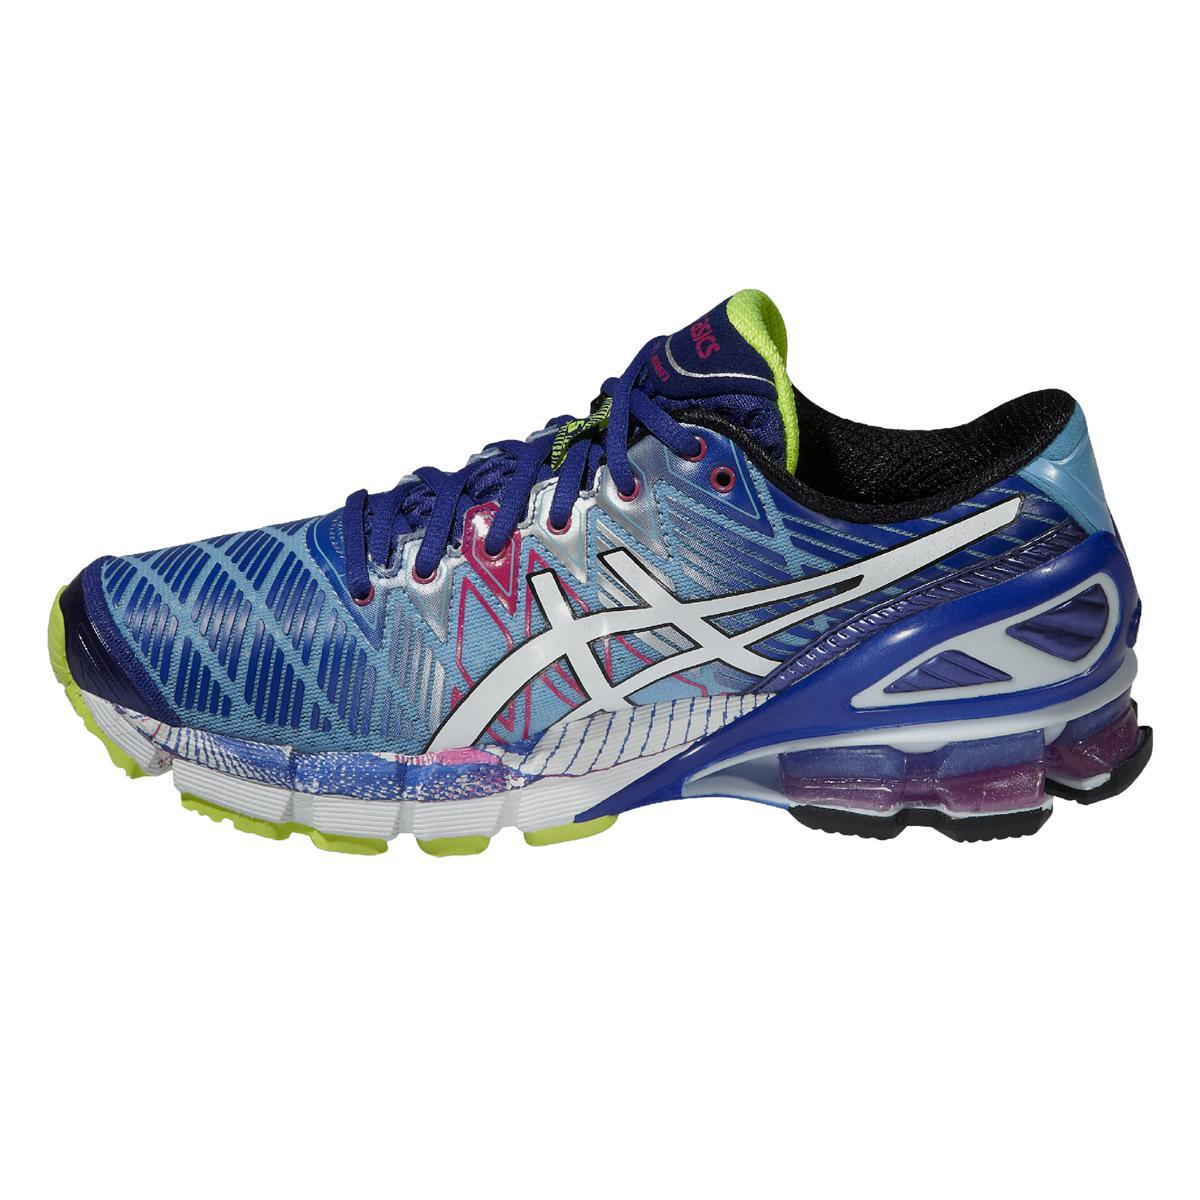 Asics Womens GEL-Kinsei 5 Running Shoes - Blue/White/Pink